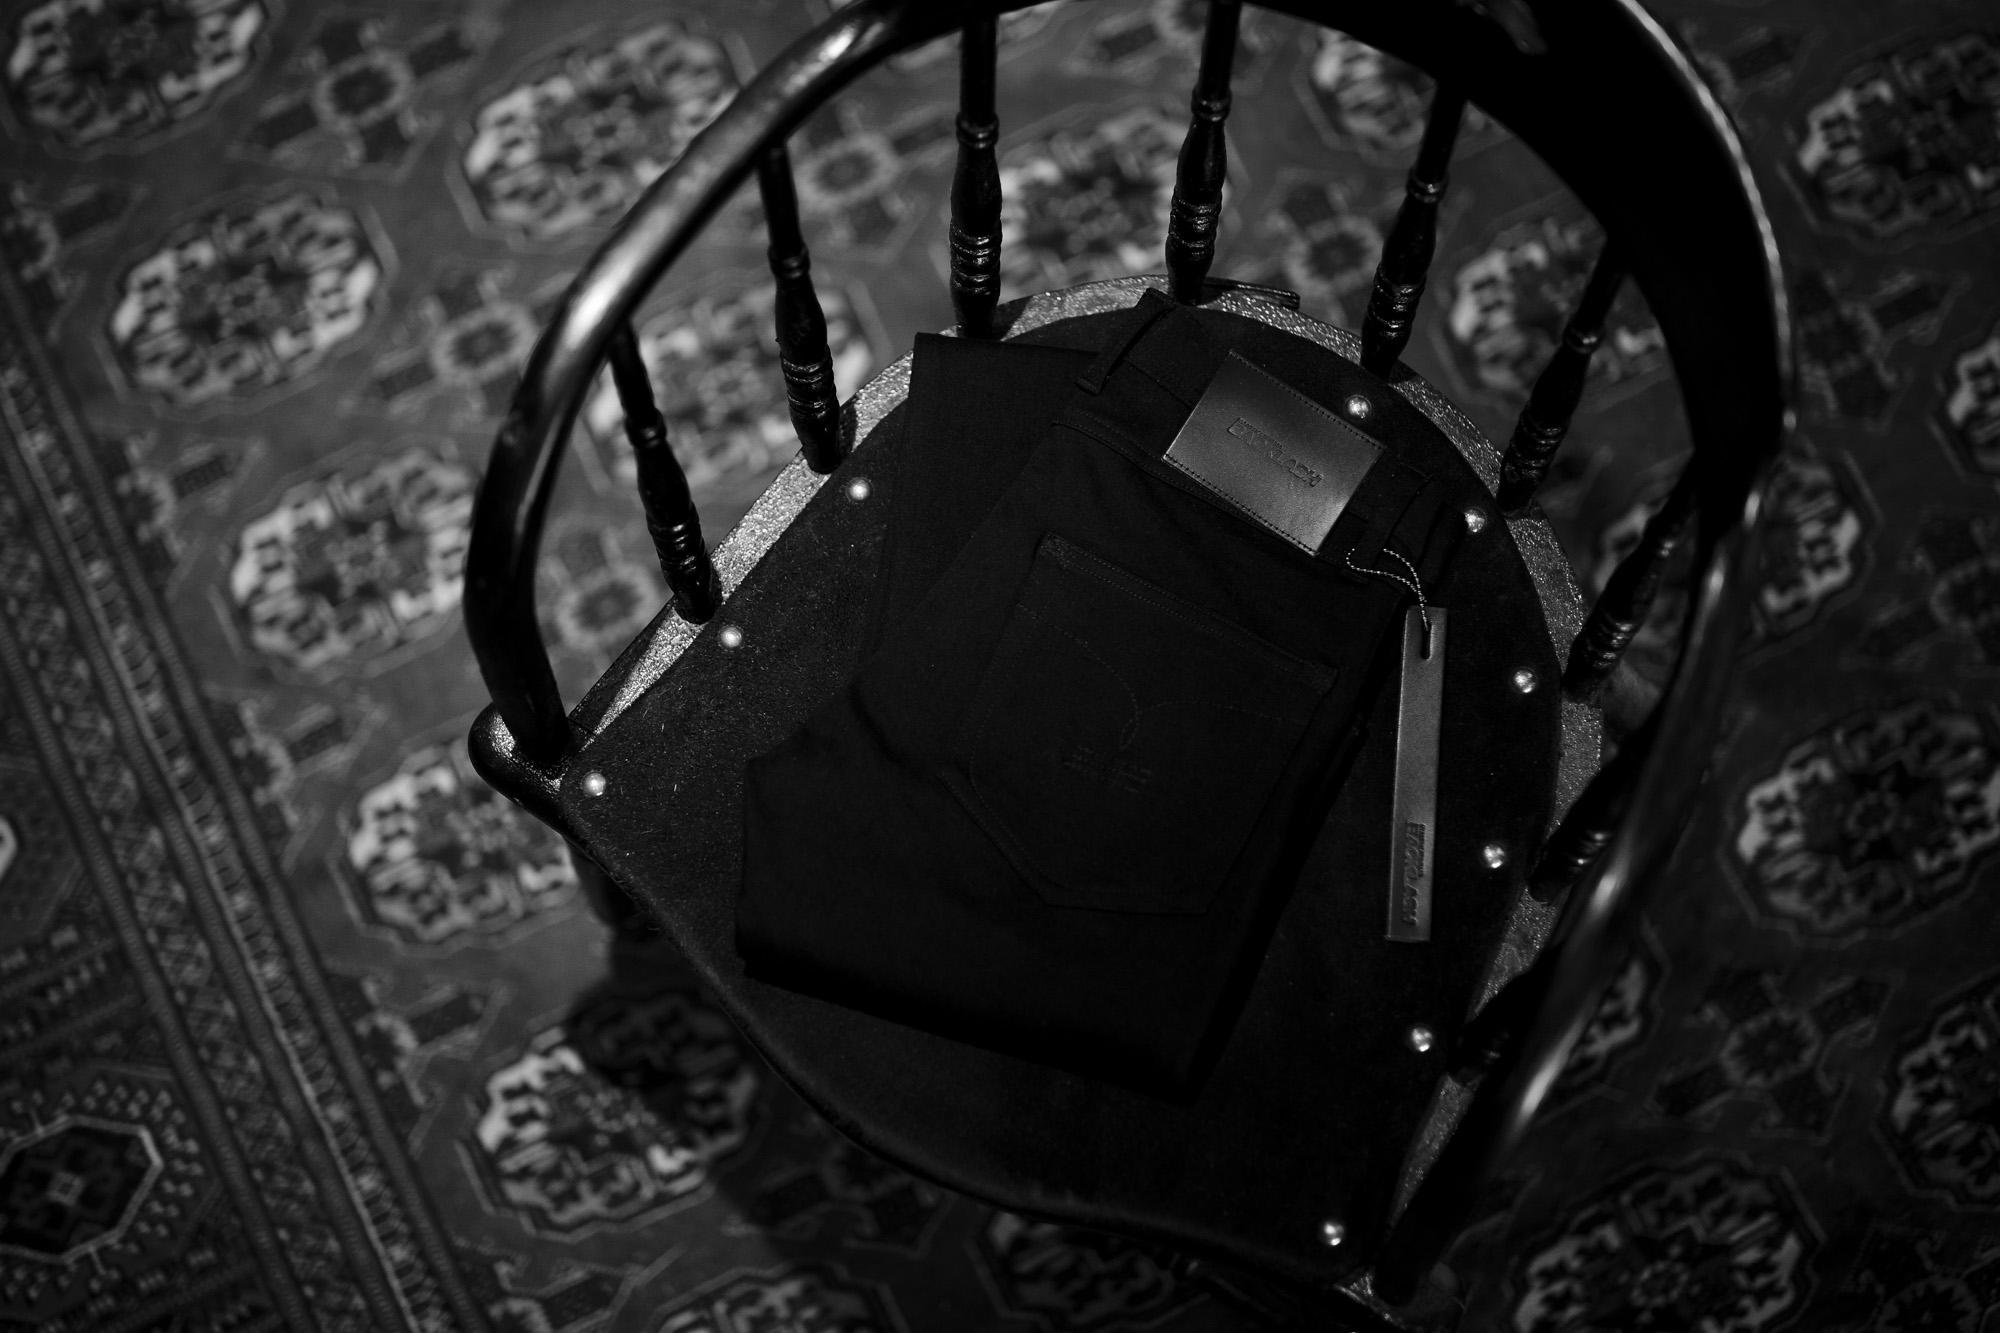 "ISAMU KATAYAMA BACKLASH ""Black Denim"" BLACK 2021 【Special Model】【Alto e Diritto別注】イサムカタヤマ バックラッシュ ストレッチ デニムパンツ クラッシュデニム ブラック ブラックデニム 黒デニム ブラックデニムパンツ 愛知 名古屋 Alto e Diritto altoediritto アルトエデリット"